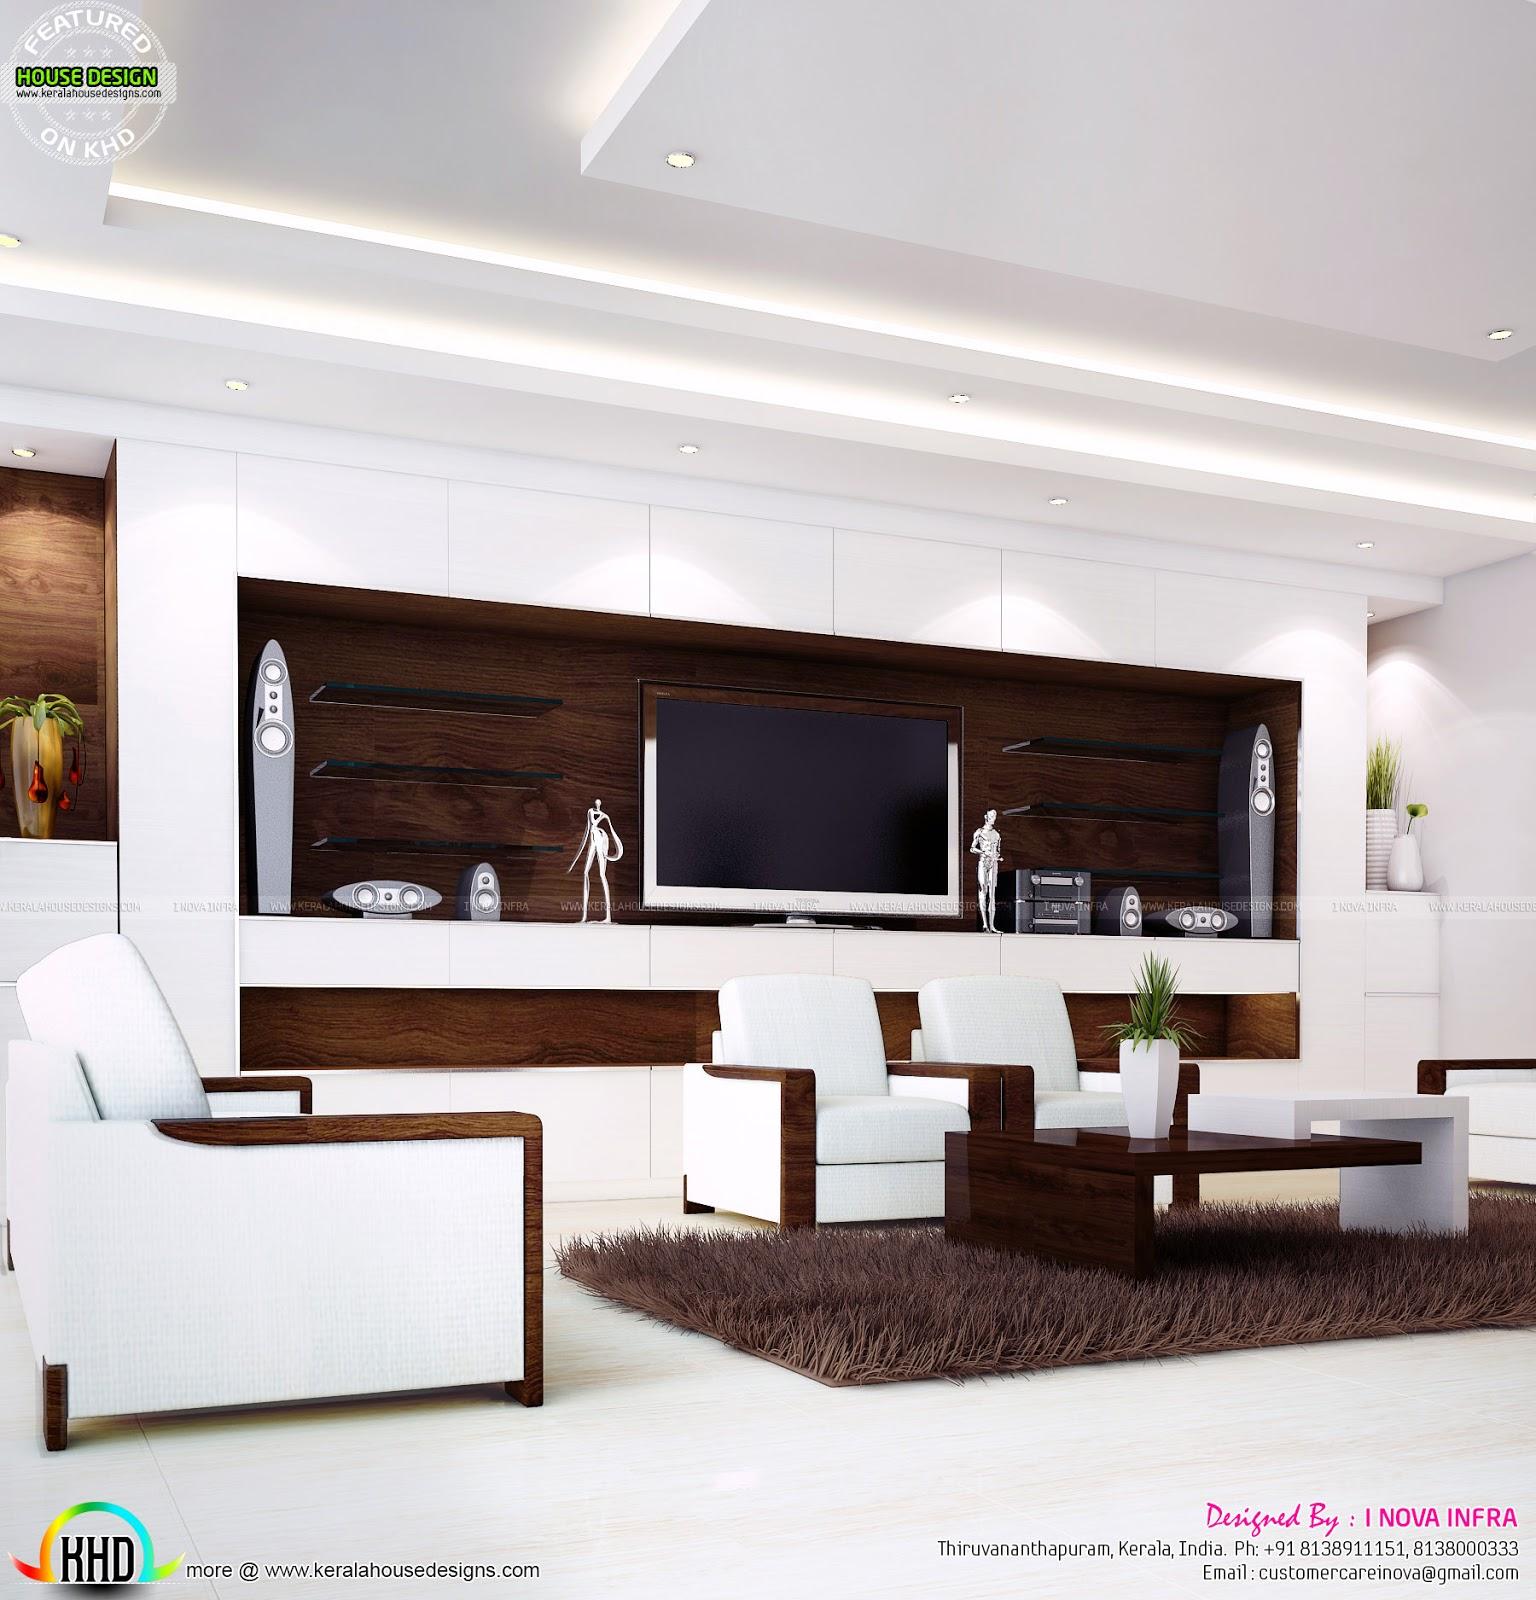 Interior Design For Kitchen In Kerala